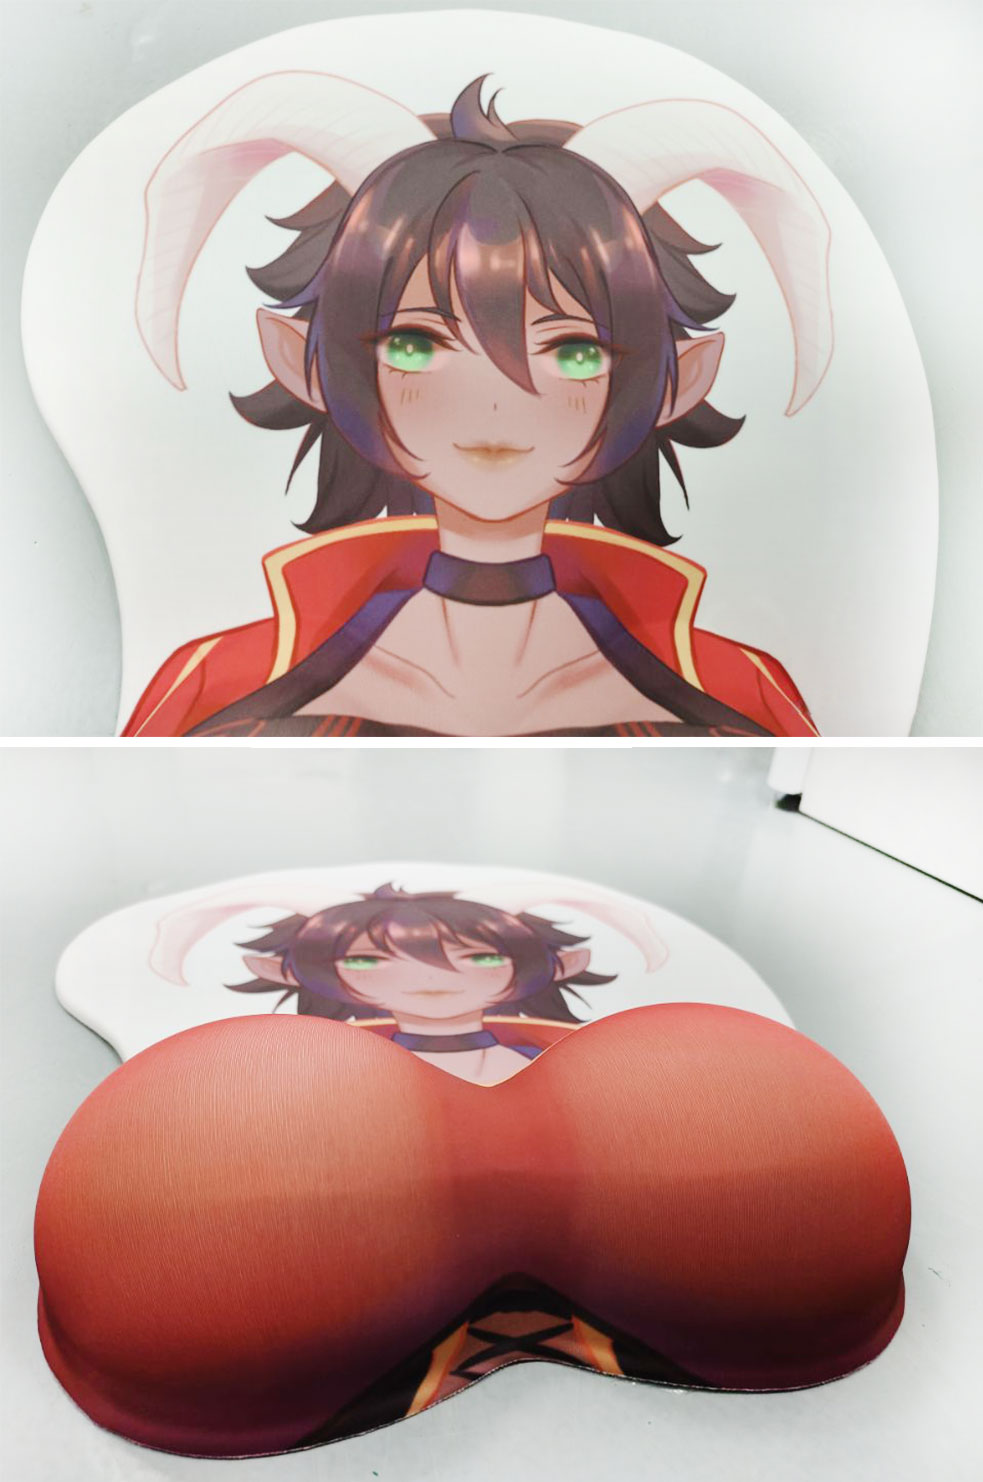 escalayer life size oppai mousepad escalayer giant oppai mouse pad 1098 - Anime Mousepads